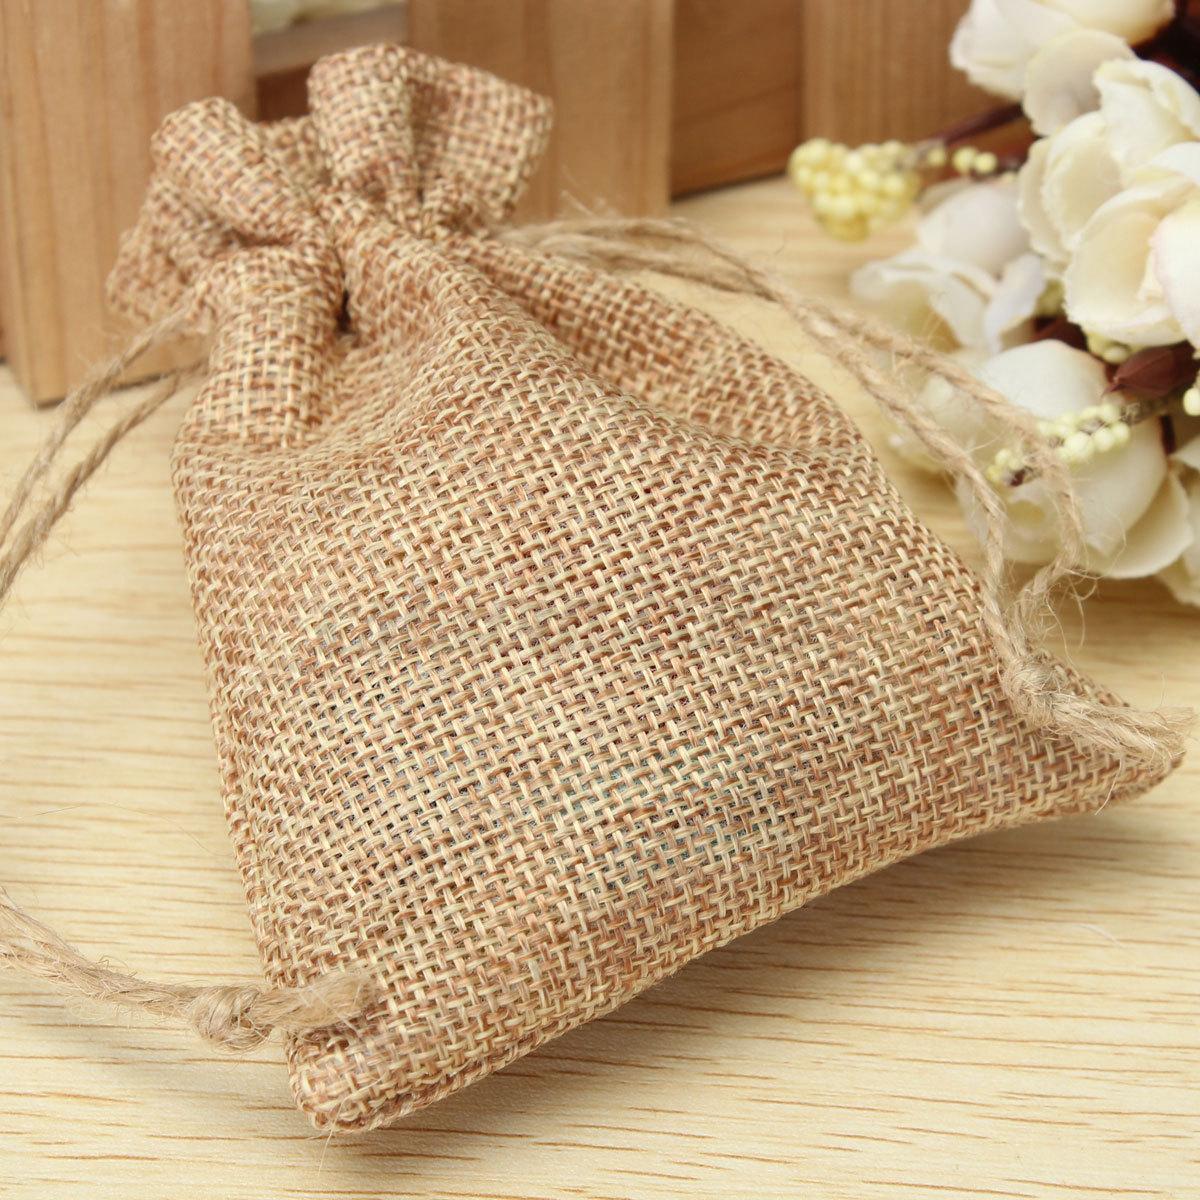 Wedding Favor Jute Bags : ... -Natural-Jute-Hessian-Drawstring-Pouch-Burlap-Wedding-Favor-Gift-Bags